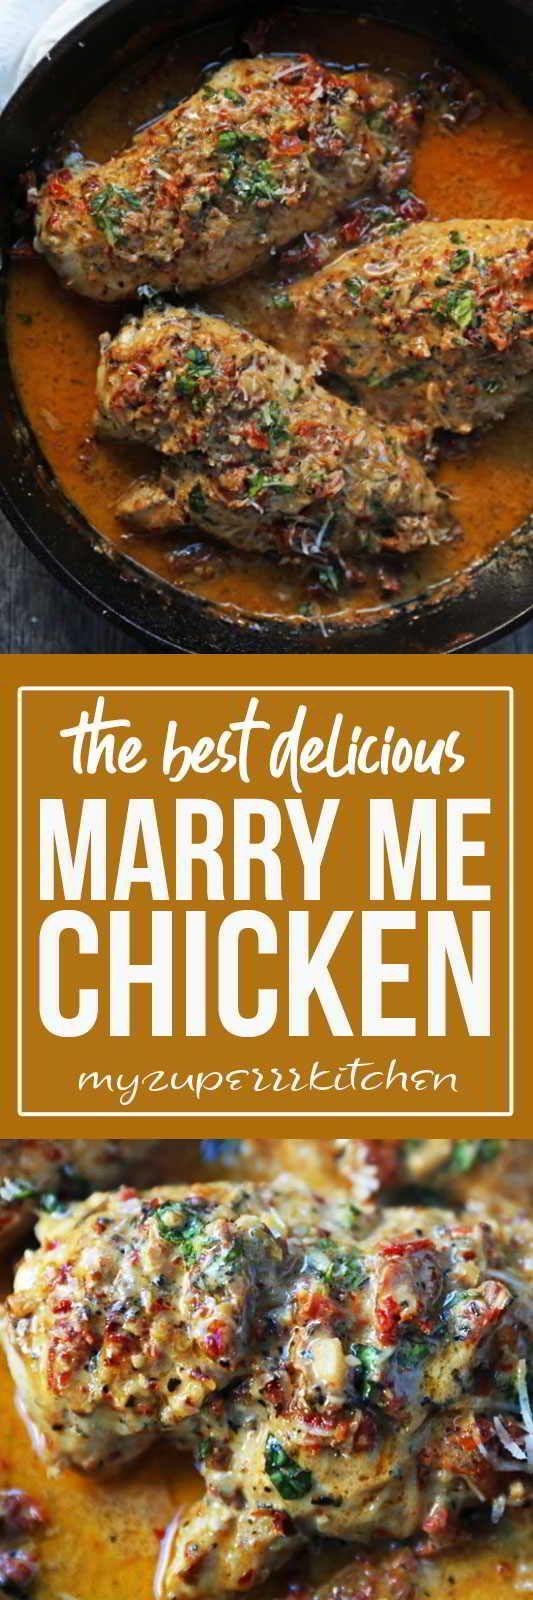 Marry Me Chicken #marrymechicken Marry Me Chicken #marrymechicken